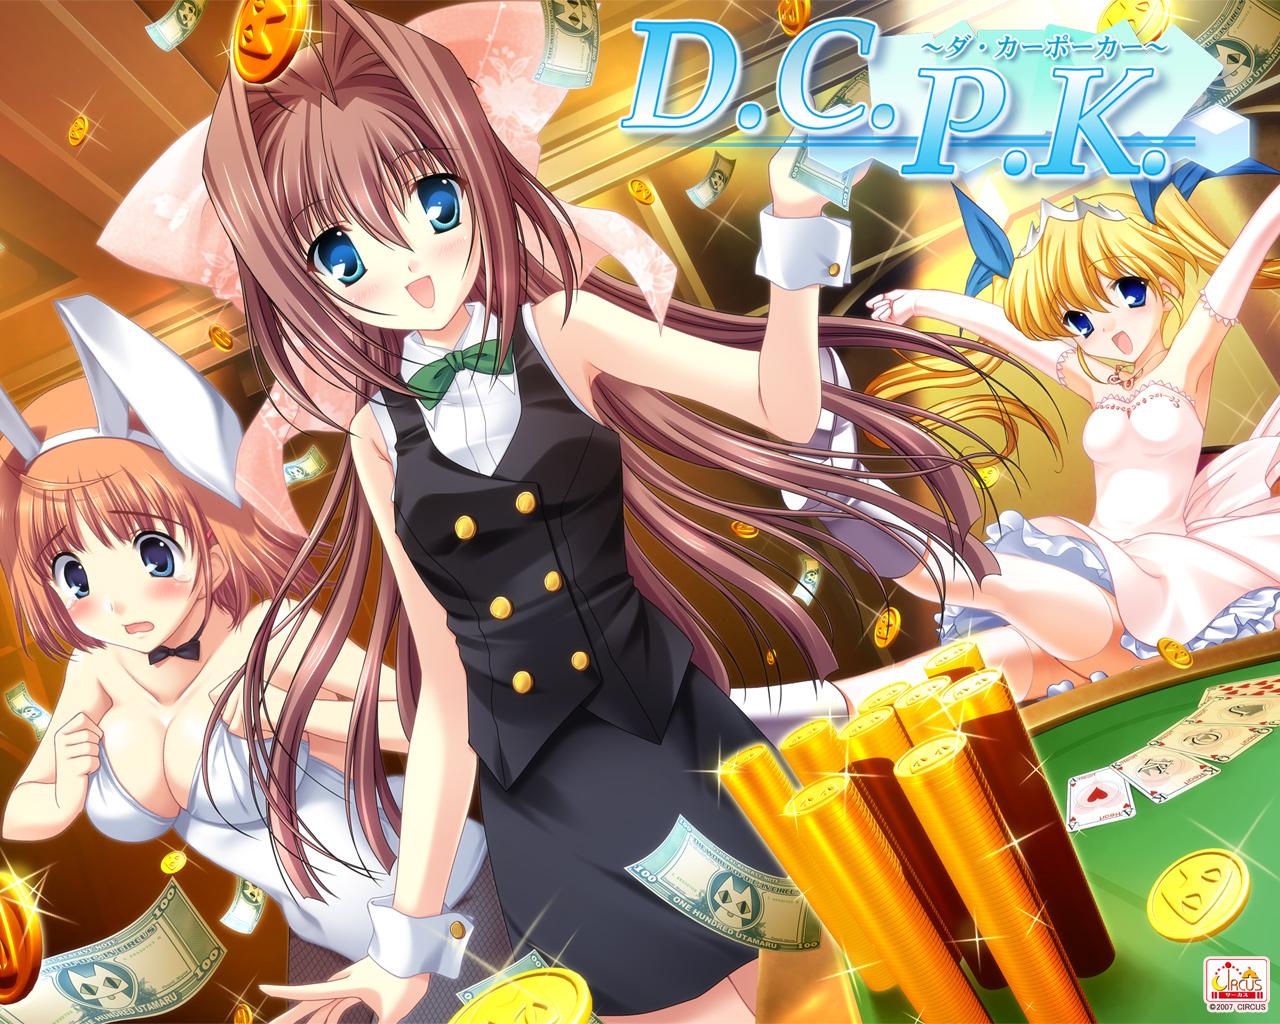 D.C.P.K. ~Da CaPoker~ Wallpaper #287768 - Zerochan Anime